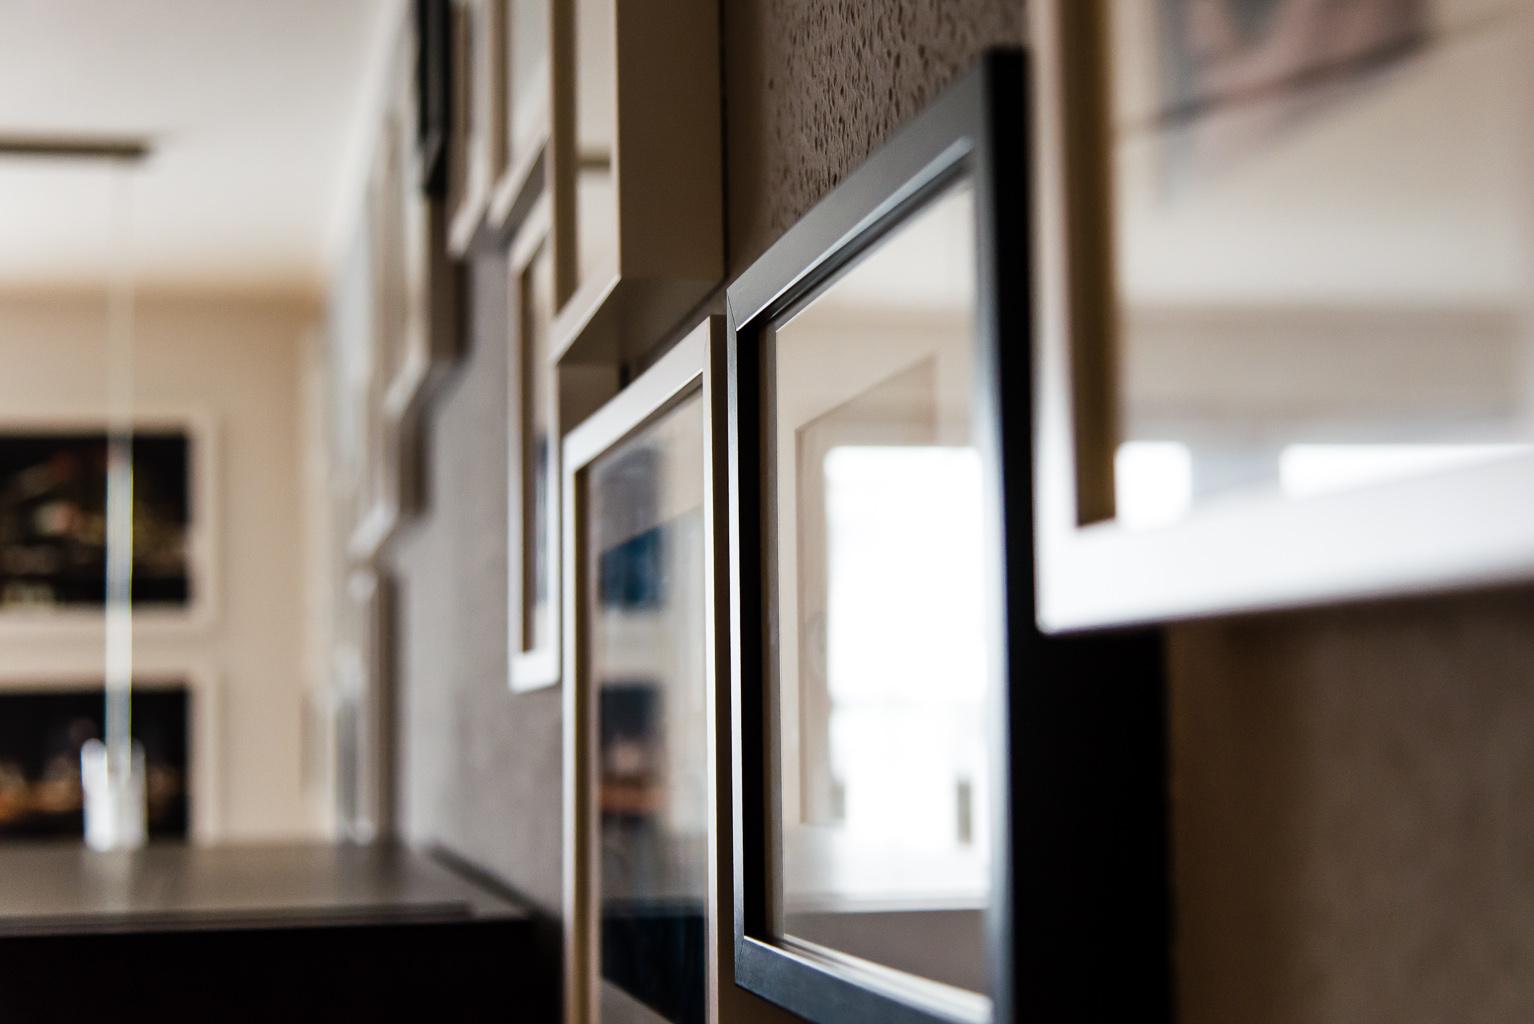 f o t o j o m o johannes modersohn photography projekt. Black Bedroom Furniture Sets. Home Design Ideas